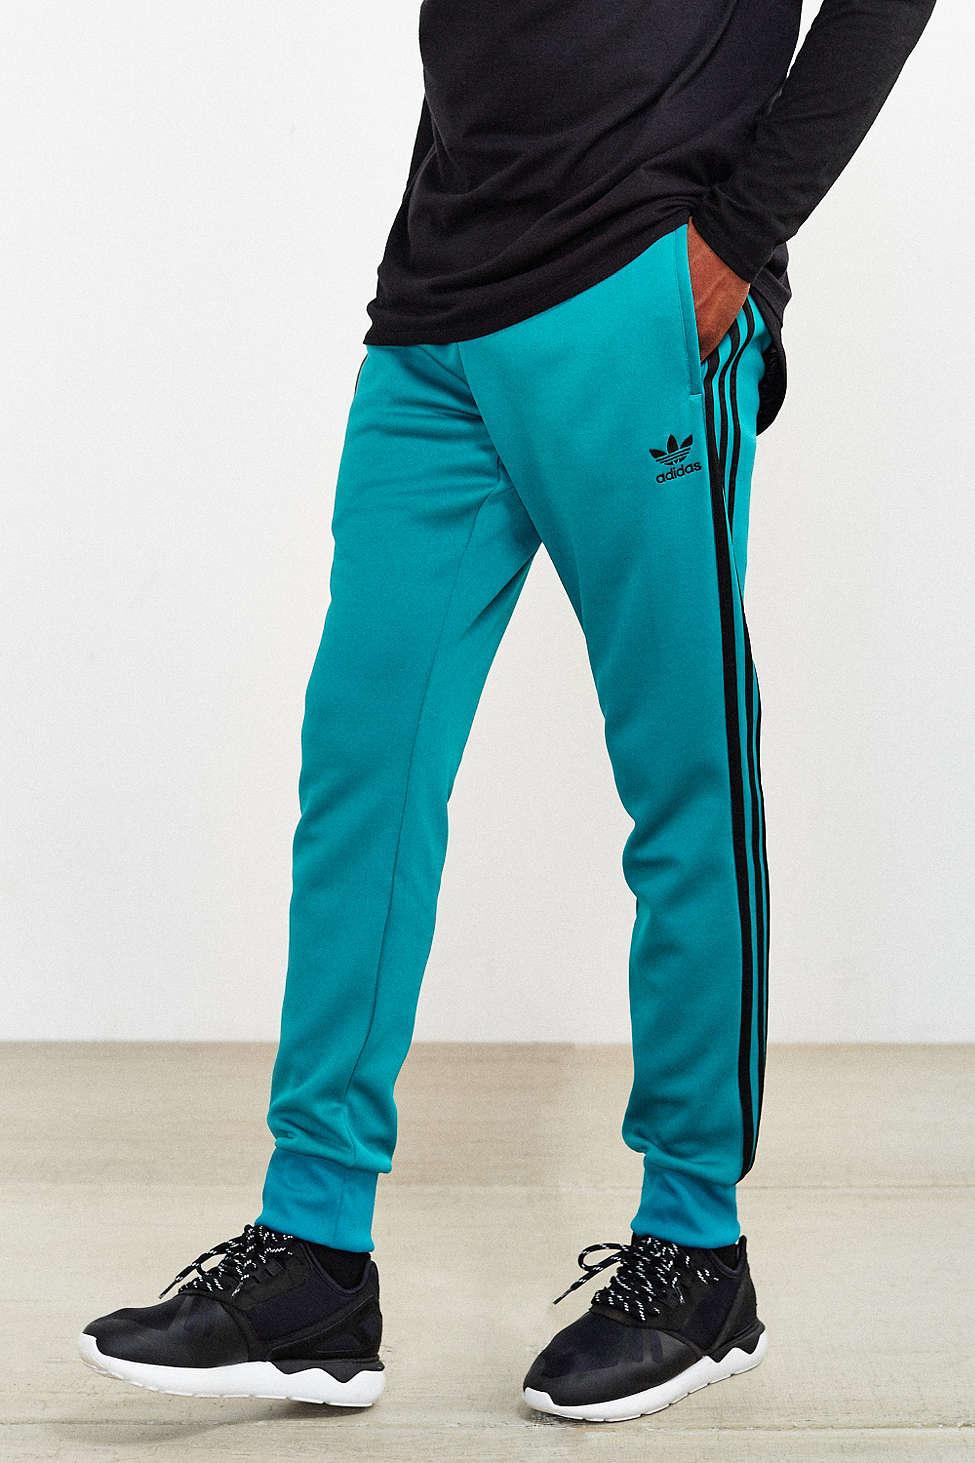 best service 34277 9d195 adidas Originals Originals Superstar Cuff Track Pant in Blue for Men ...